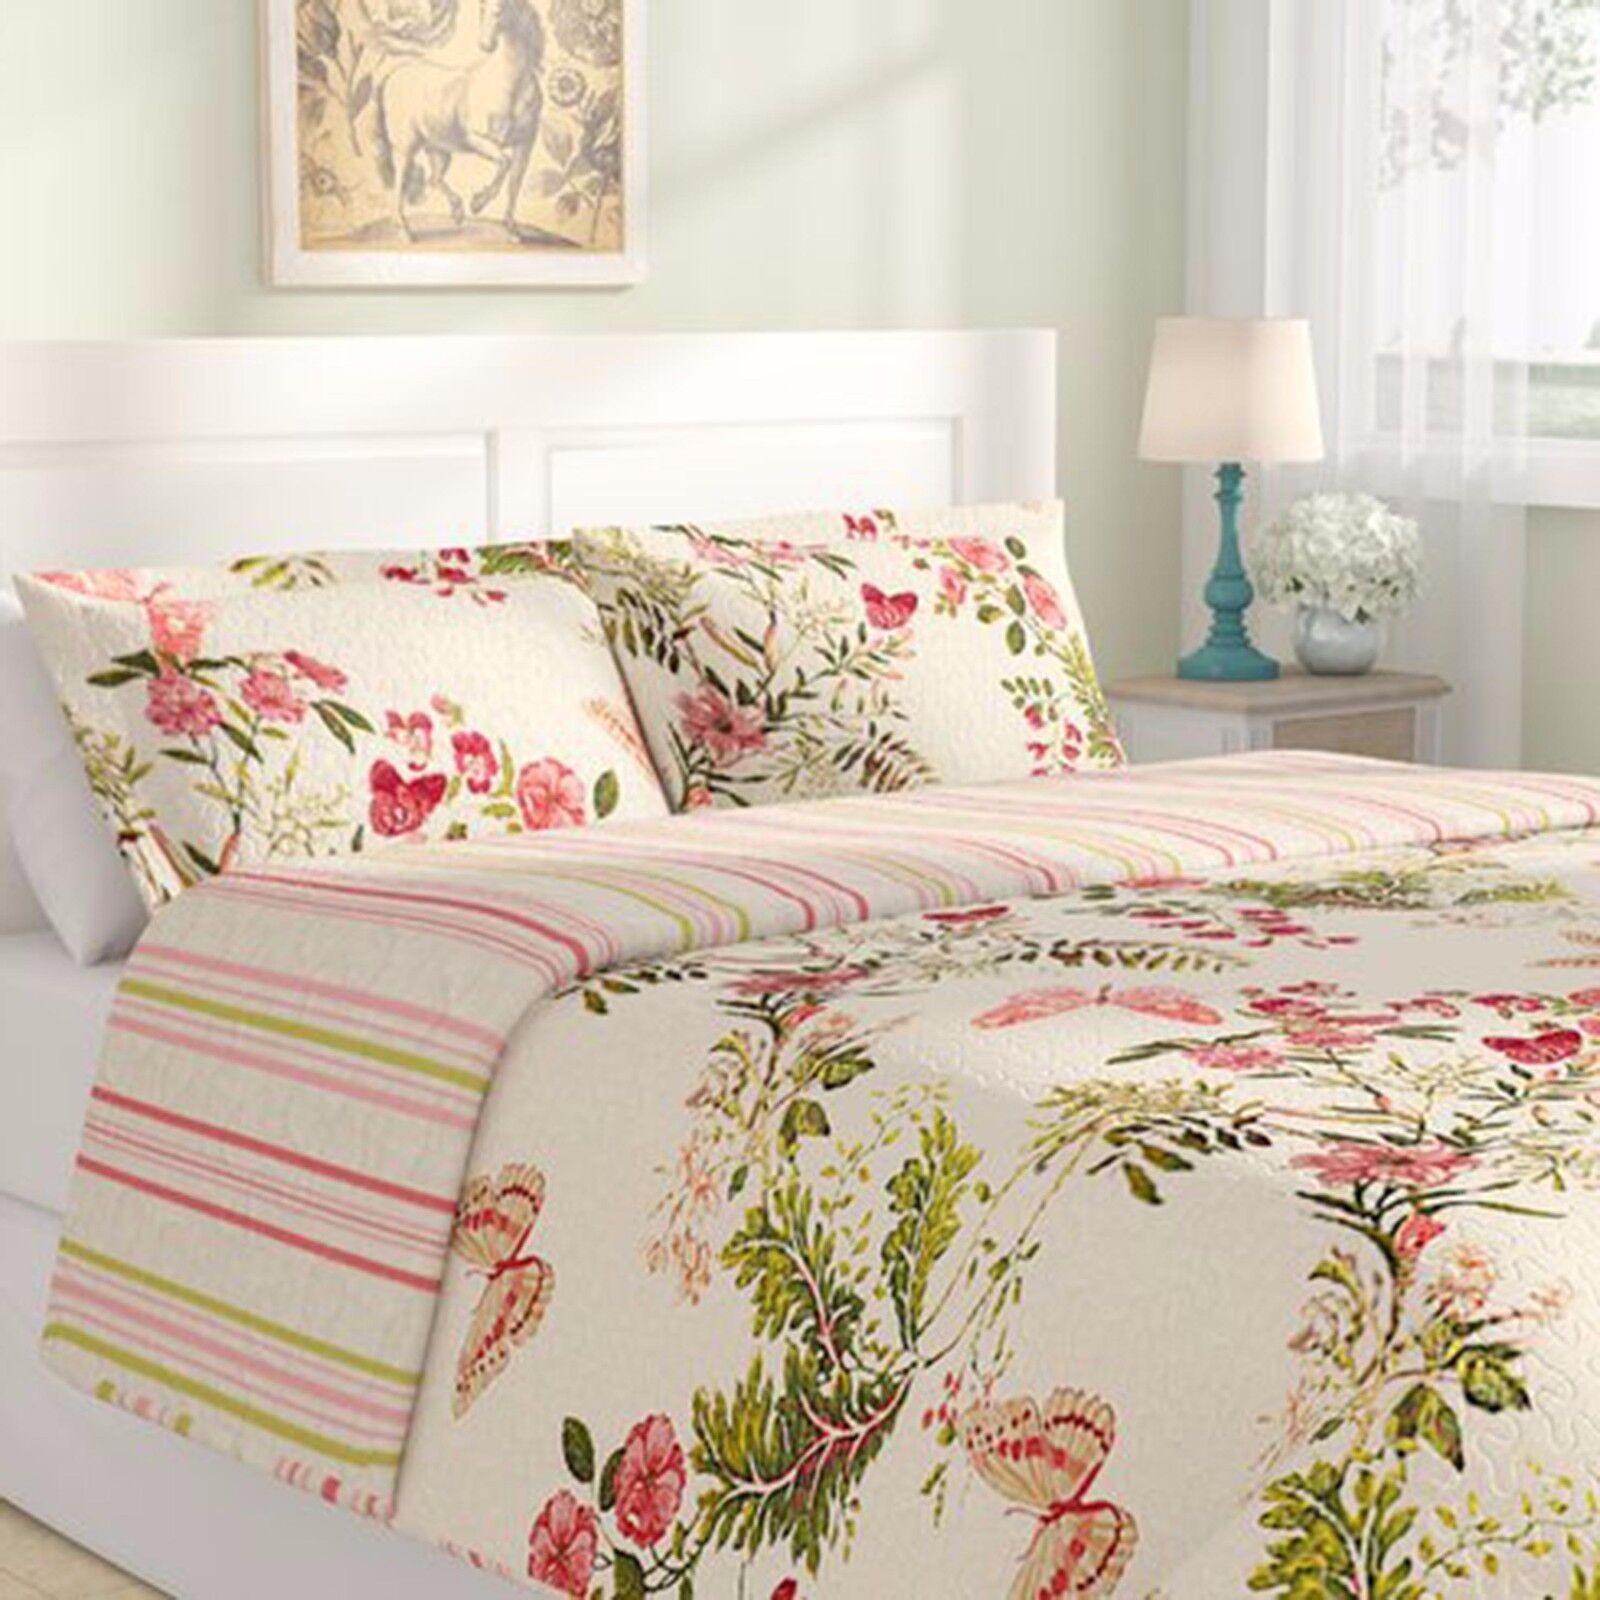 Full Queen Size Quilt Set Shams Reversible Bedspread Coverlet Cotton Floral